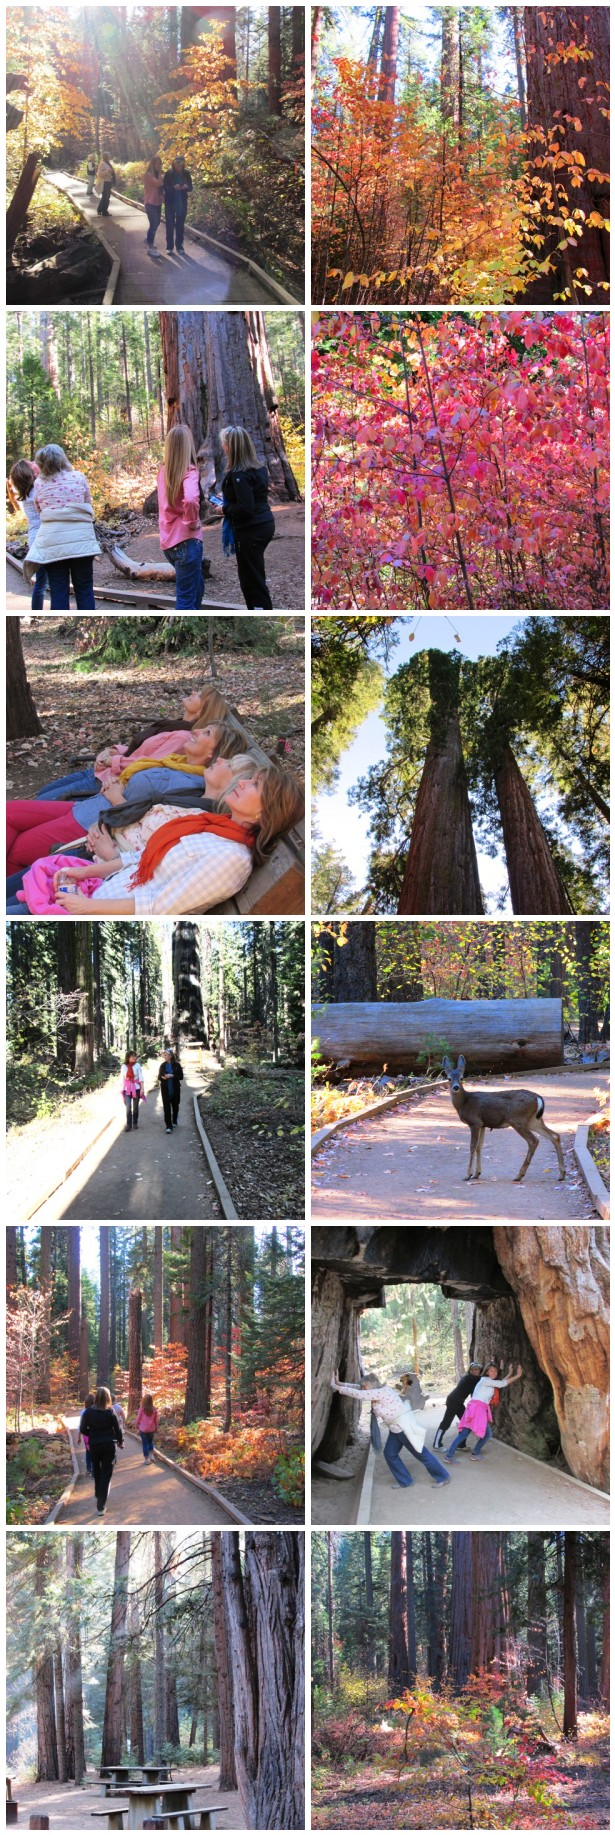 Cabin-weekend-hiking